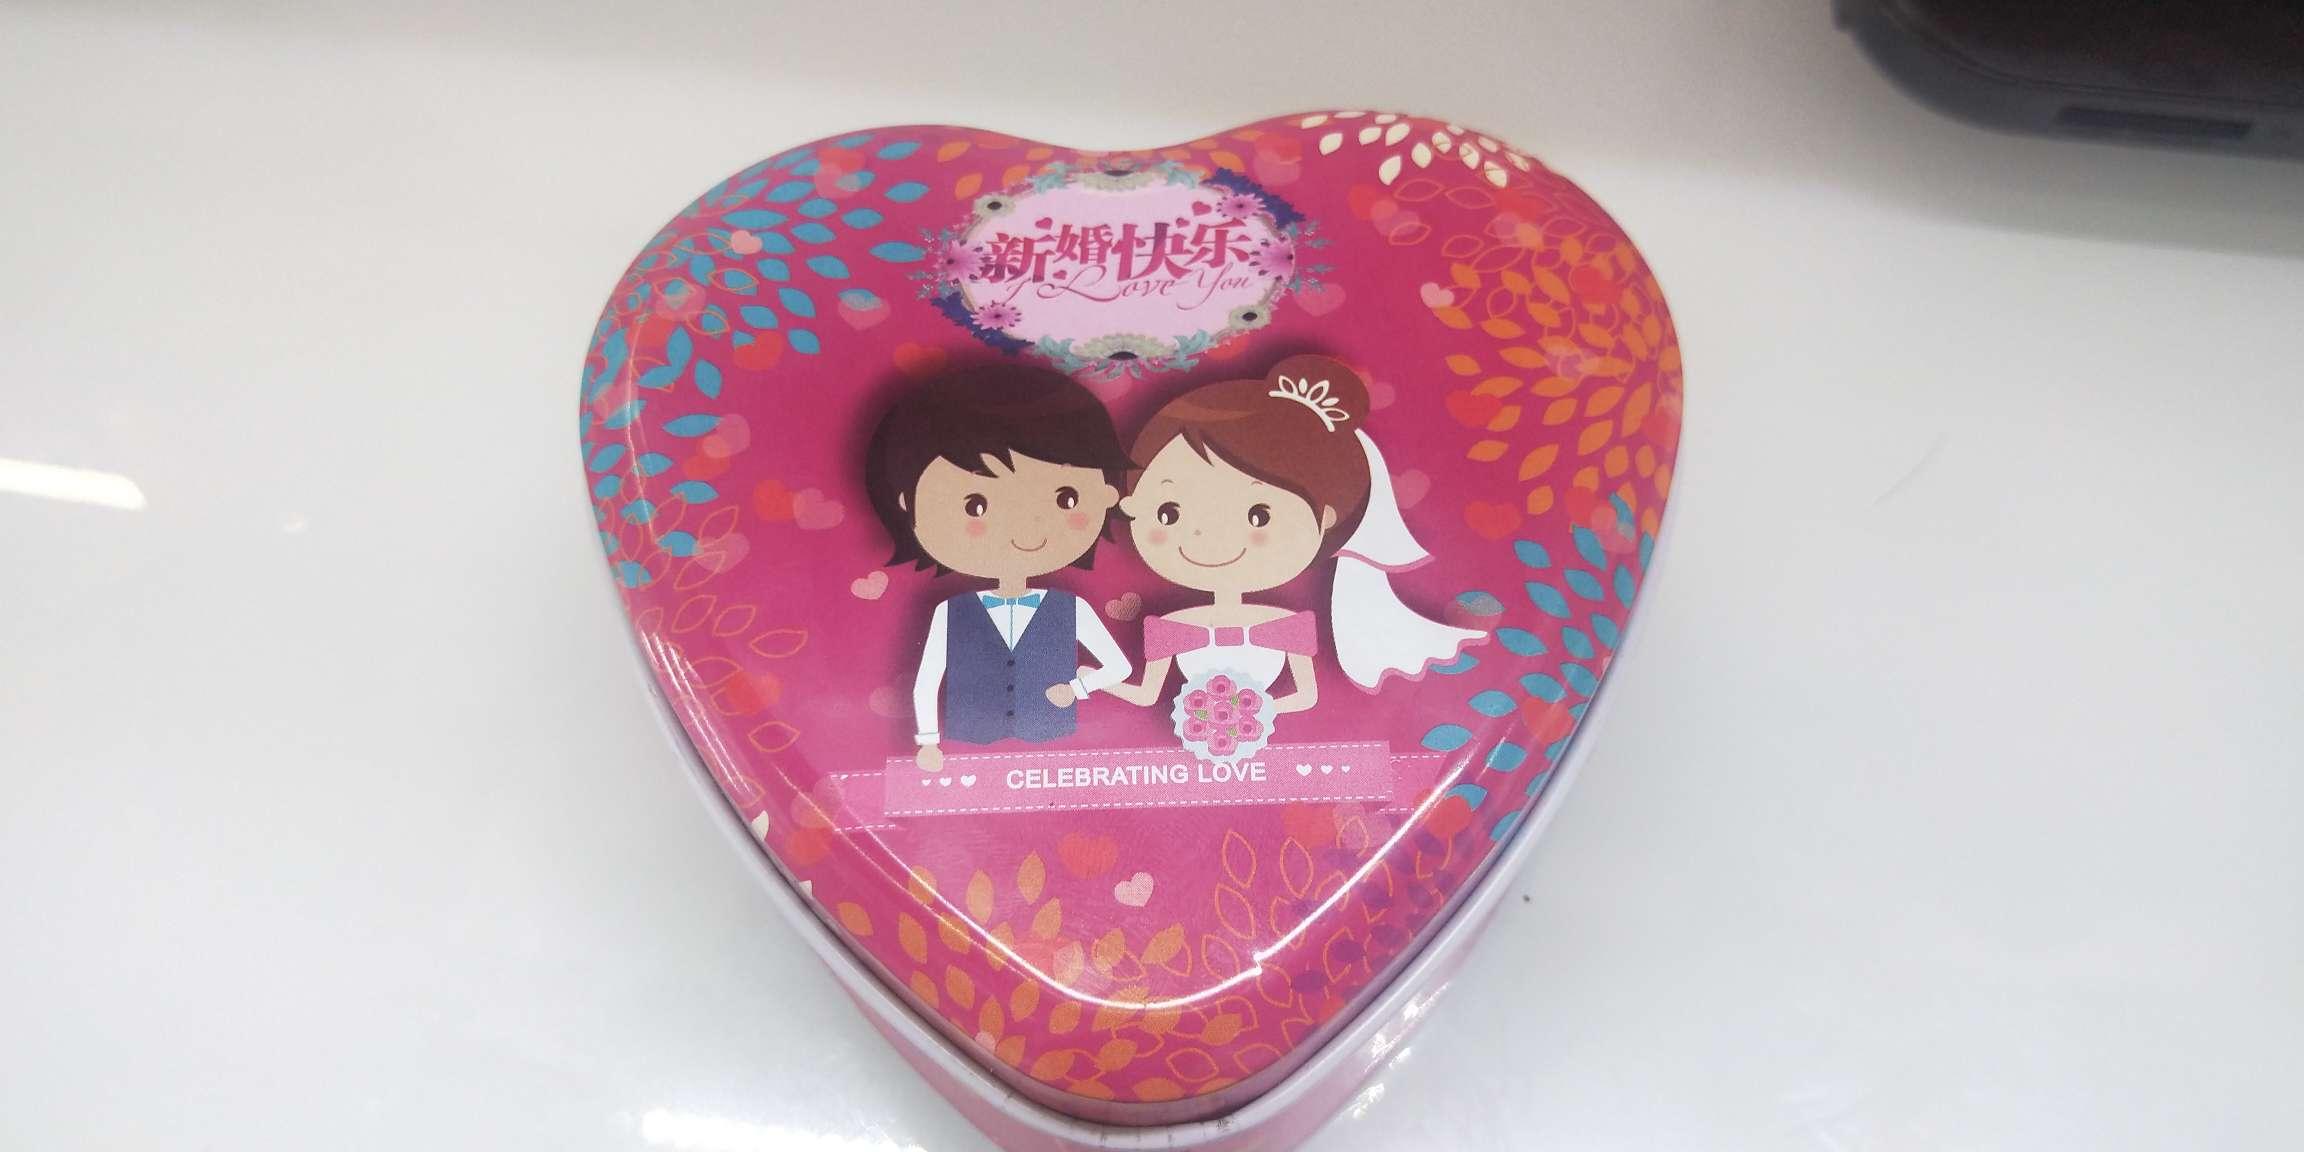 10*9.5*4.5(cm)精美爱心形包装铁盒 礼品盒Z-18